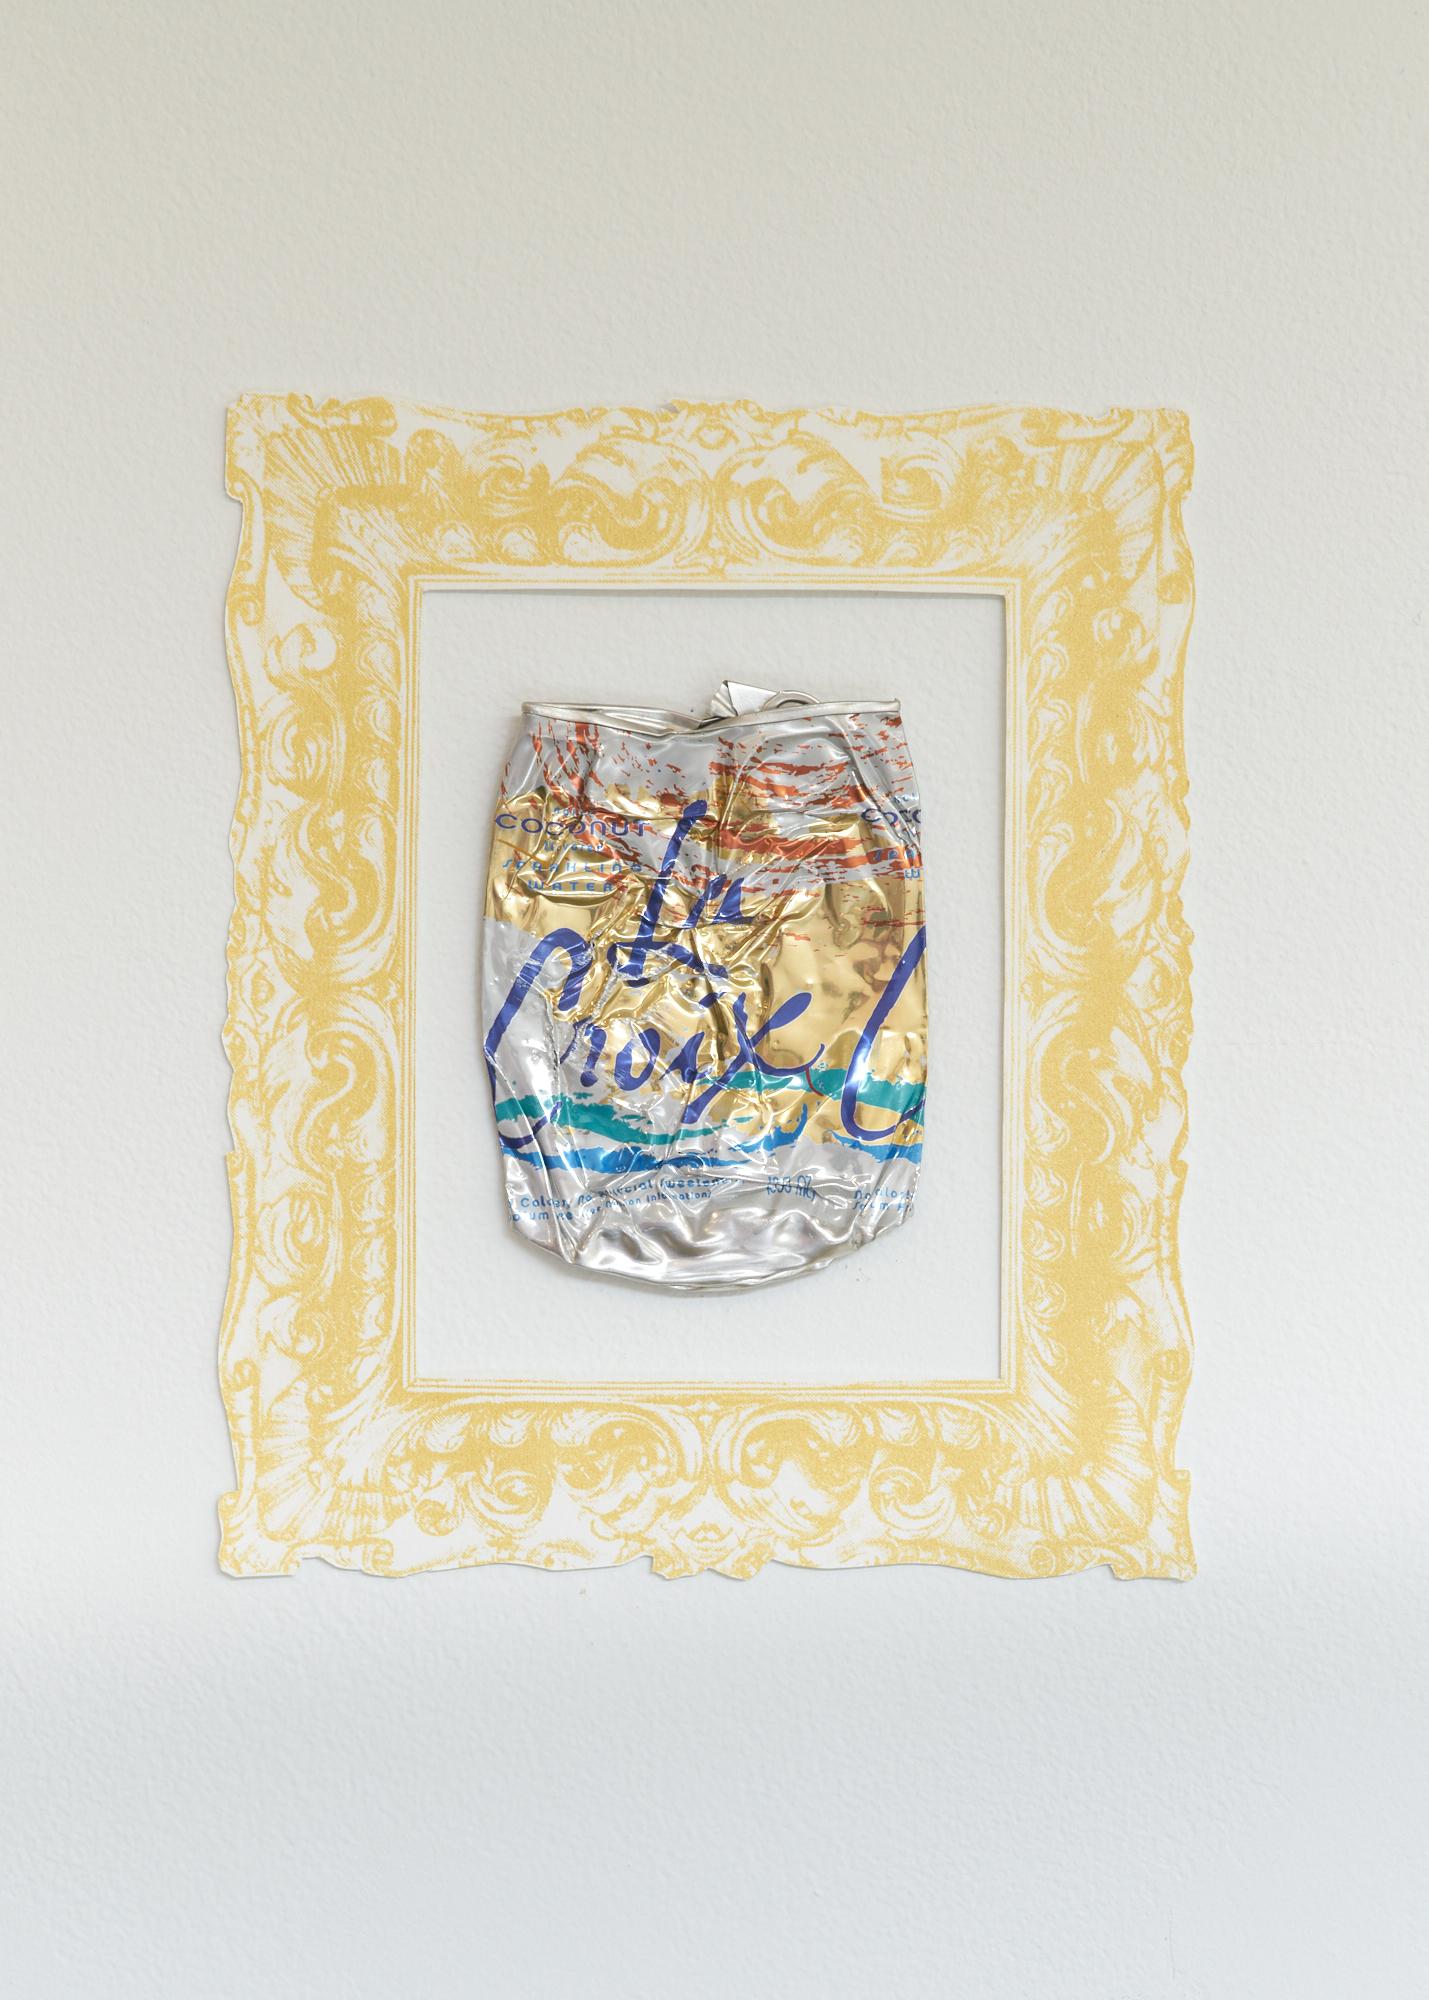 Framed La Croix can